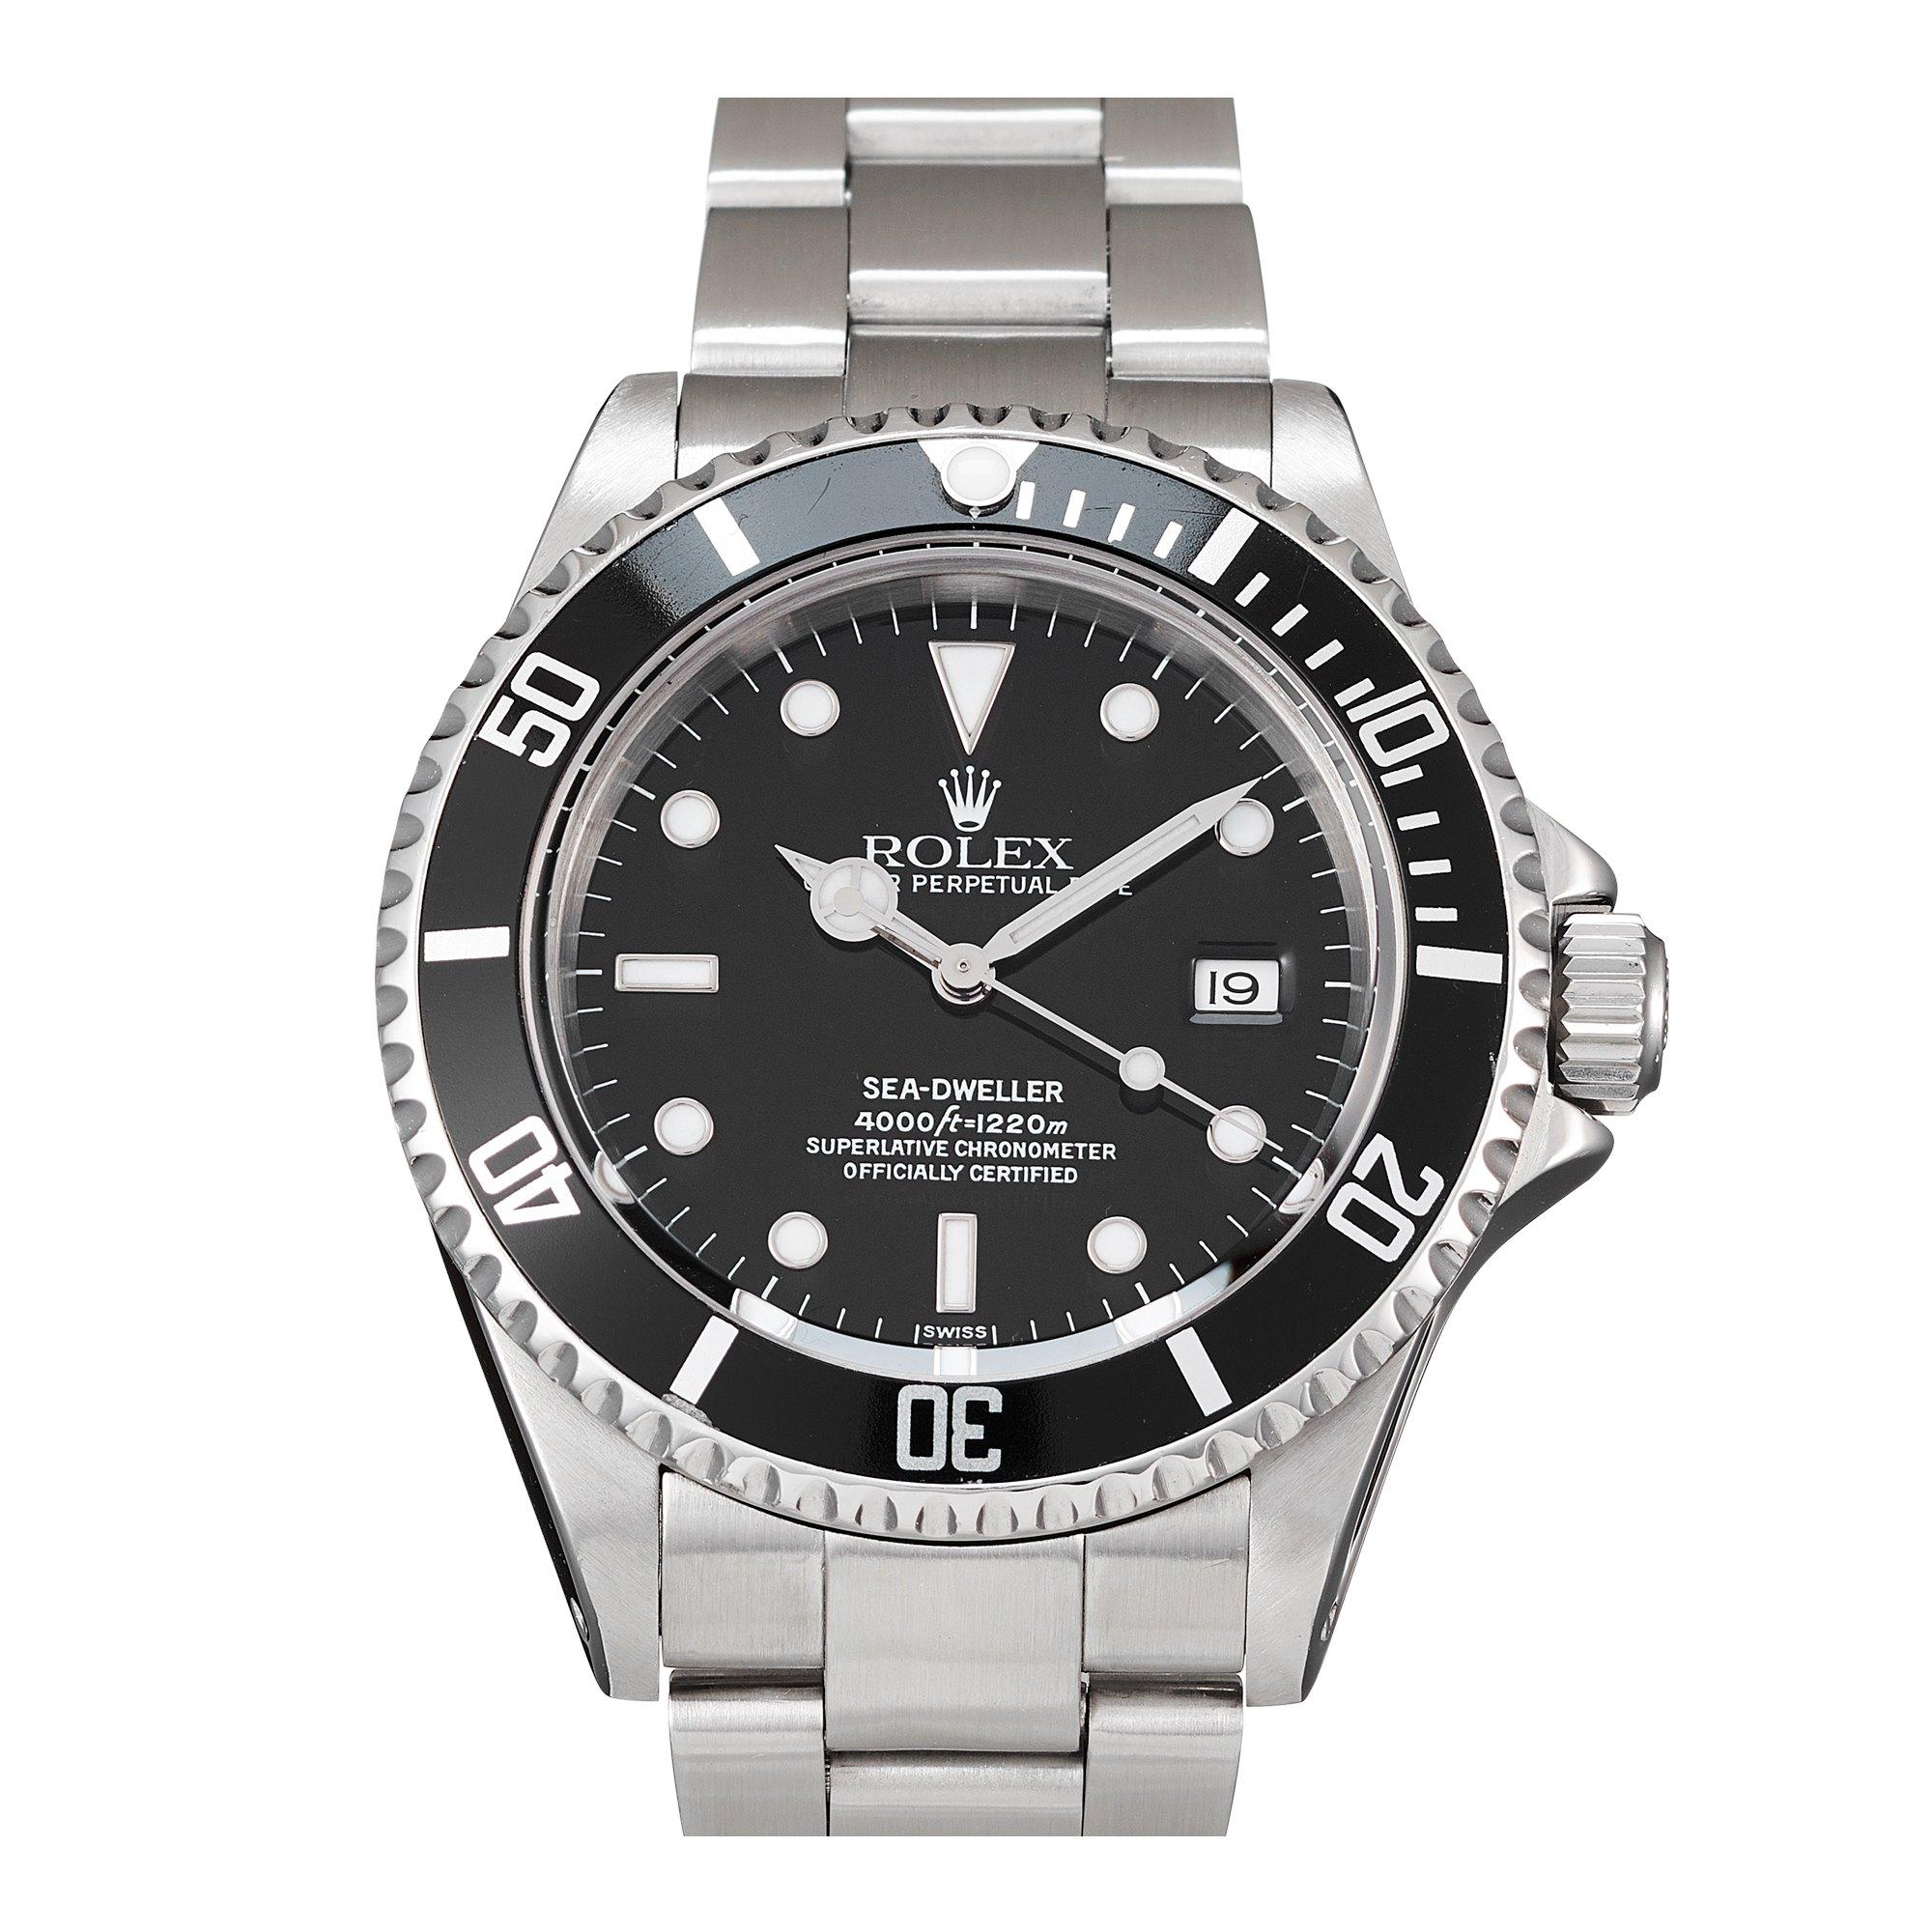 Rolex Sea-Dweller Stainless Steel 16600